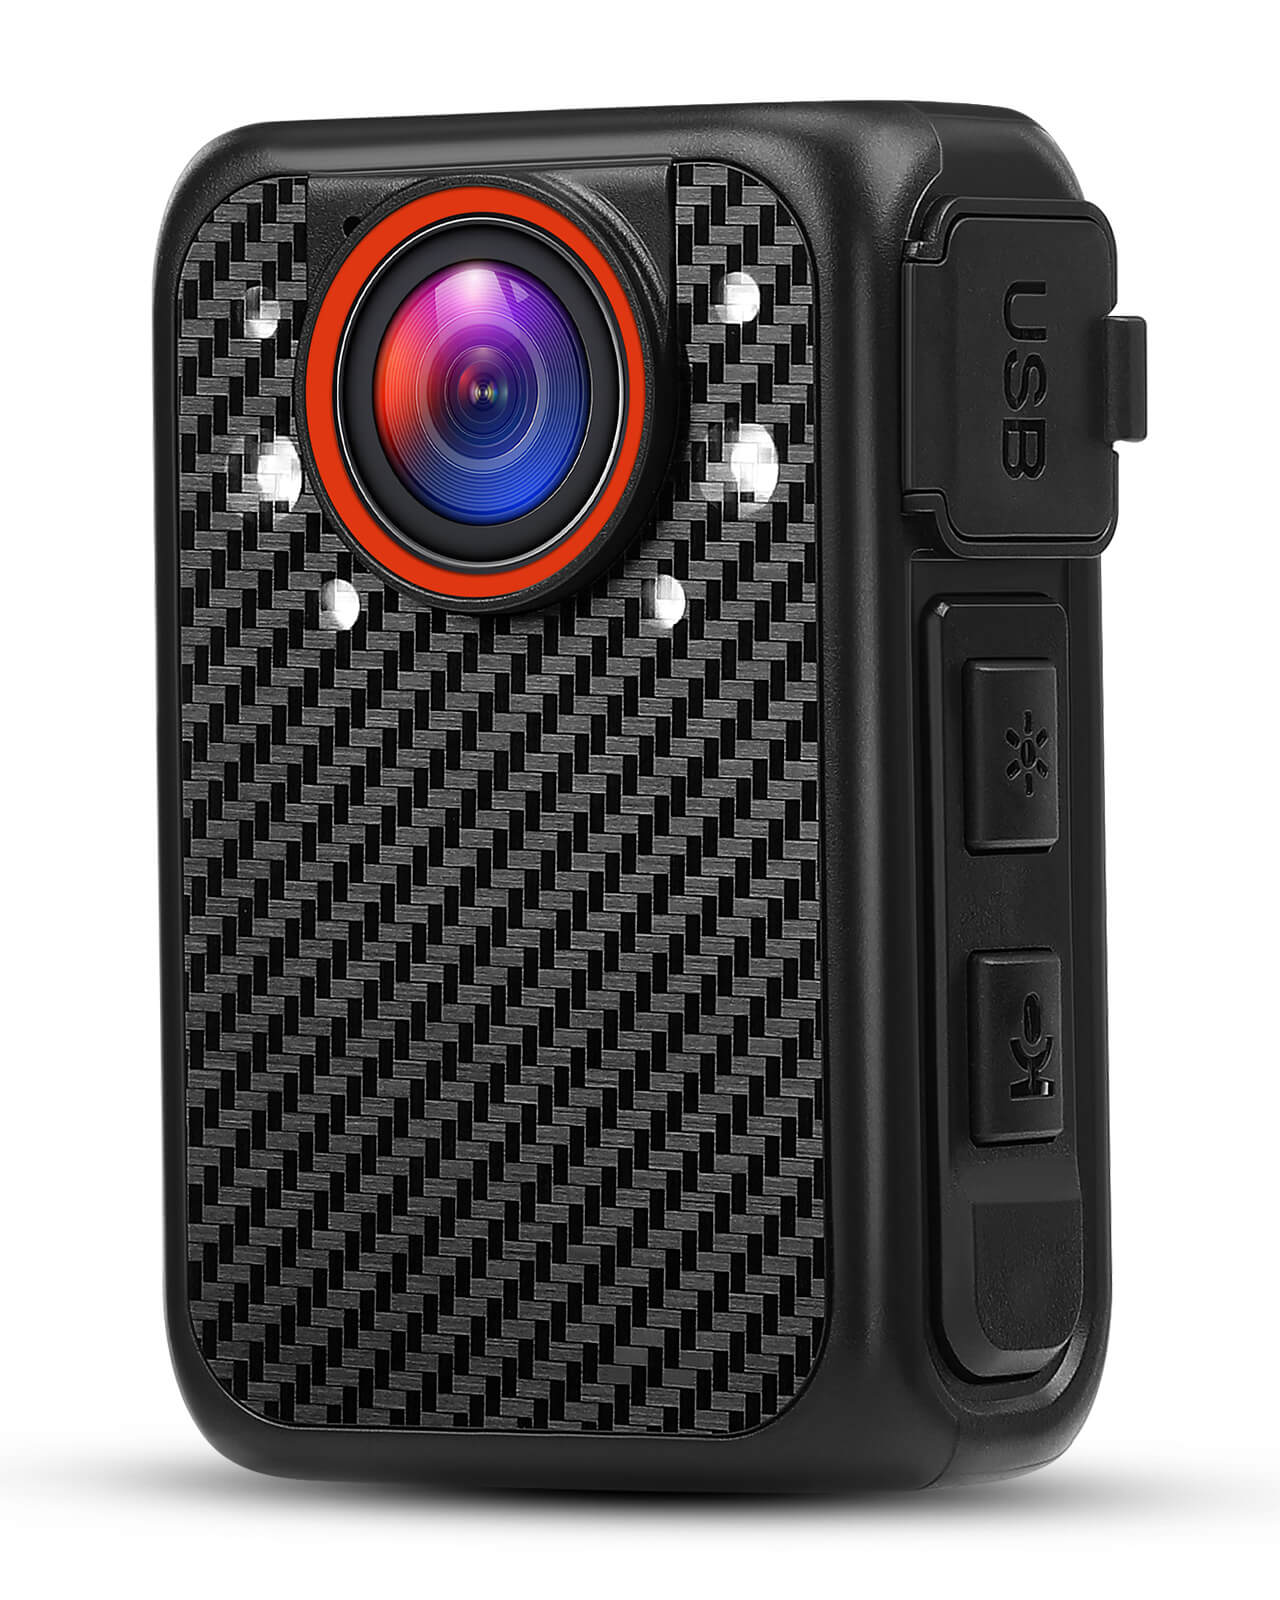 BOBLOV X1 بوديكام 1080P المحمولة الشرطة كاميرا يمكن حملها بالجسم دعم 128GB للرؤية الليلية البالية الأمن كامارا كاميرات الفيديو المصغرة